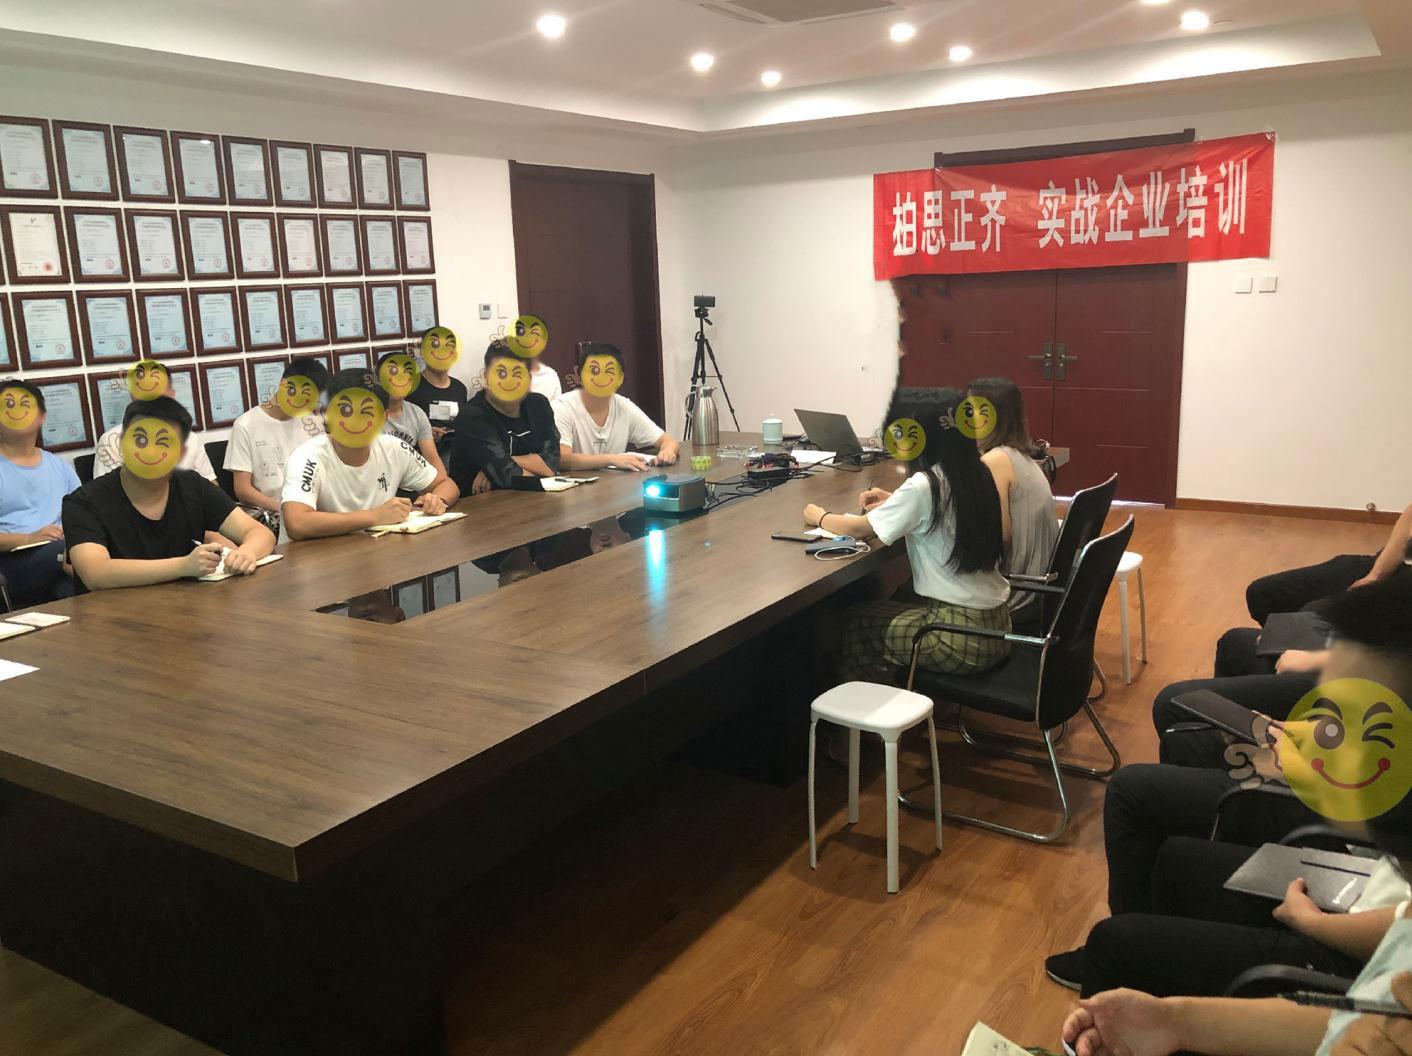 title='浙江大境筑科技发展有限公司'